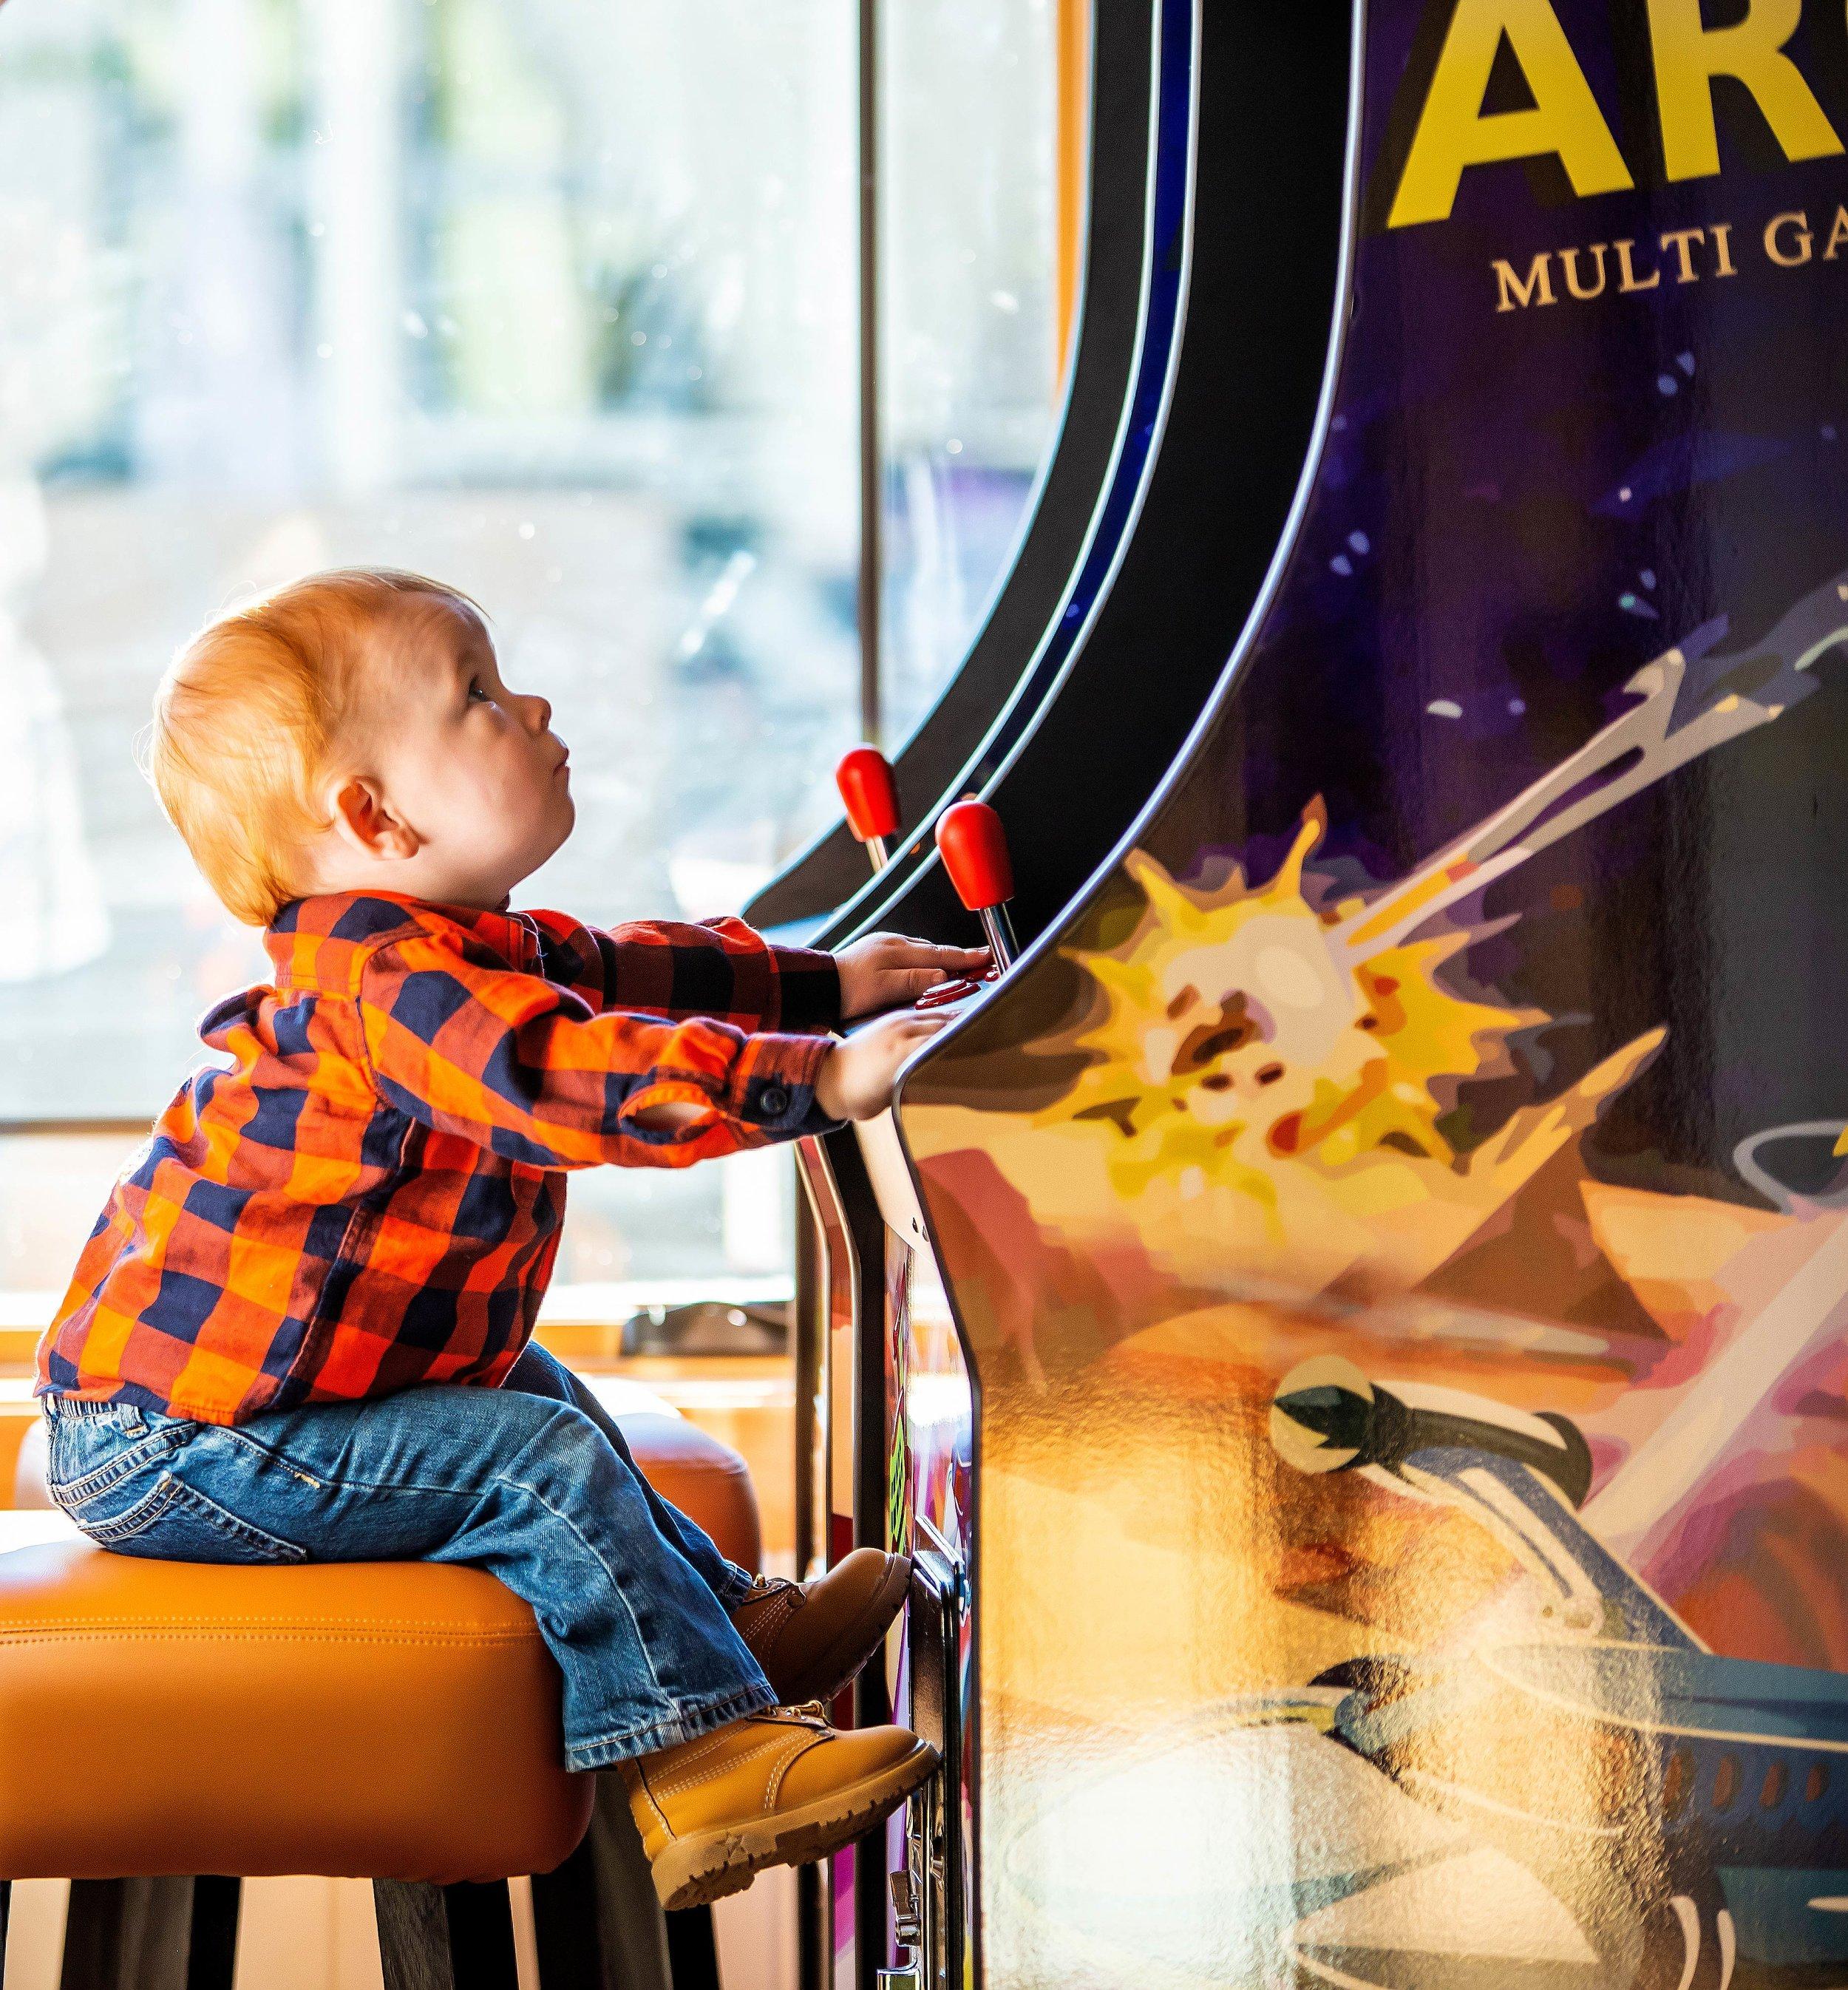 lawsons finest taproom arcade child.jpg